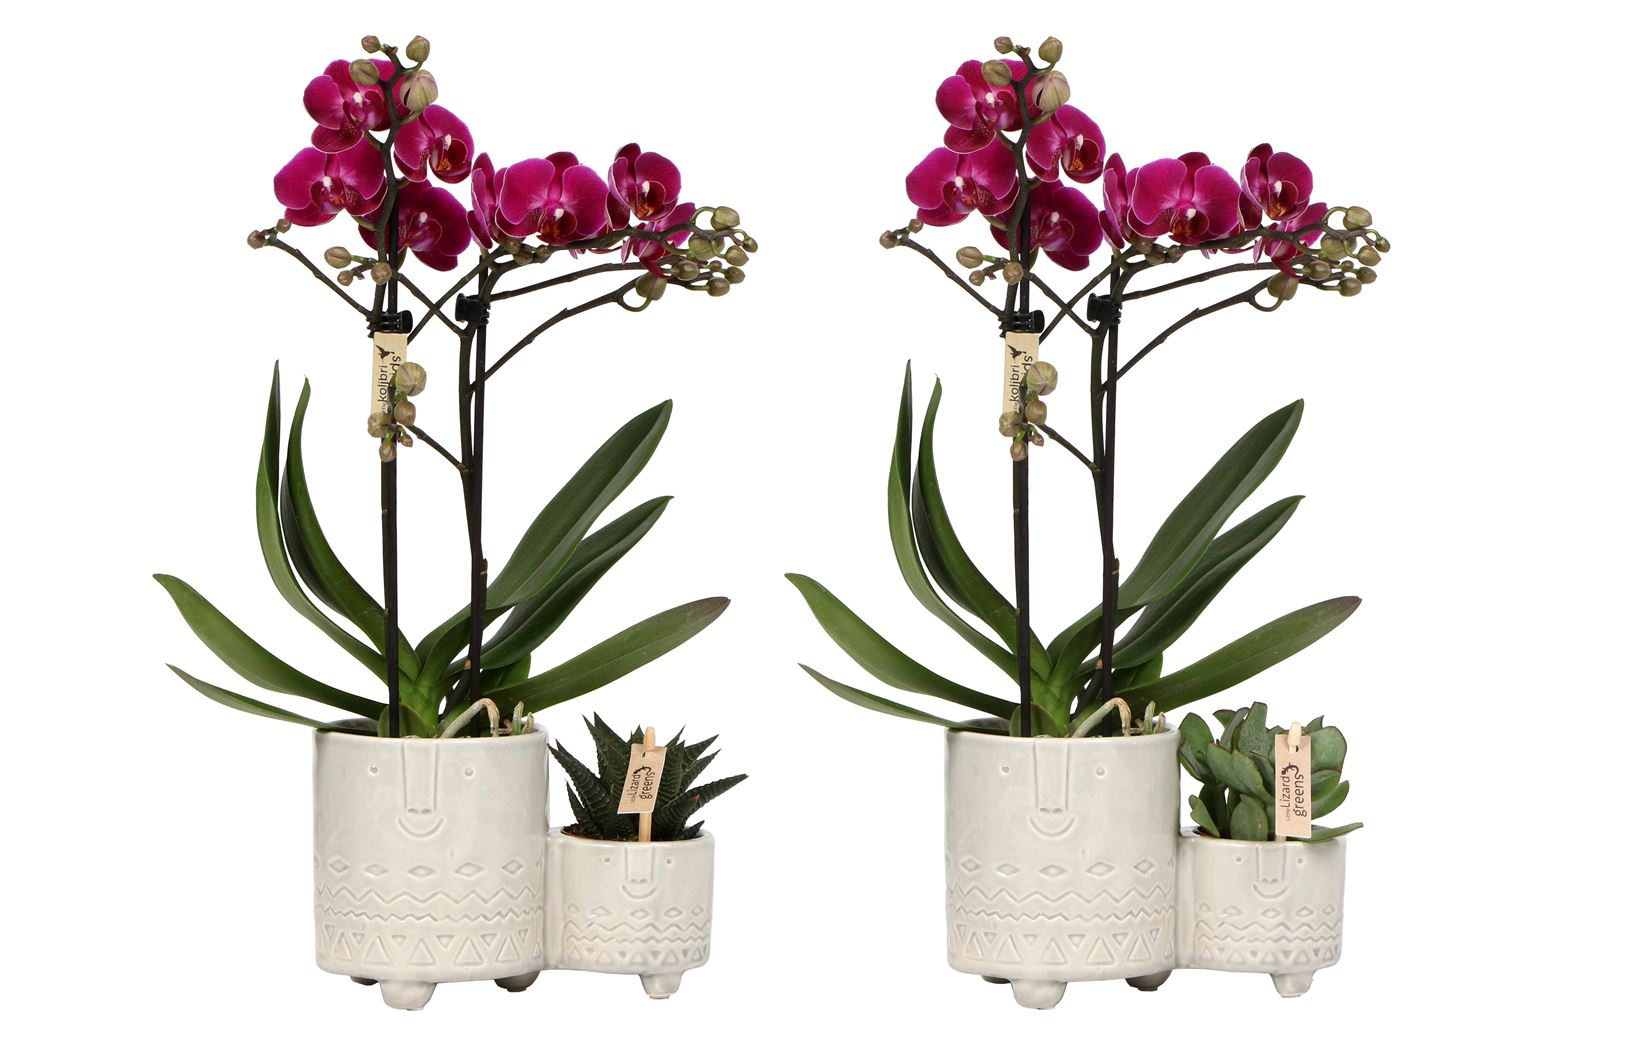 phalaenopsis little kolibri 2 spike with succulent family twins white